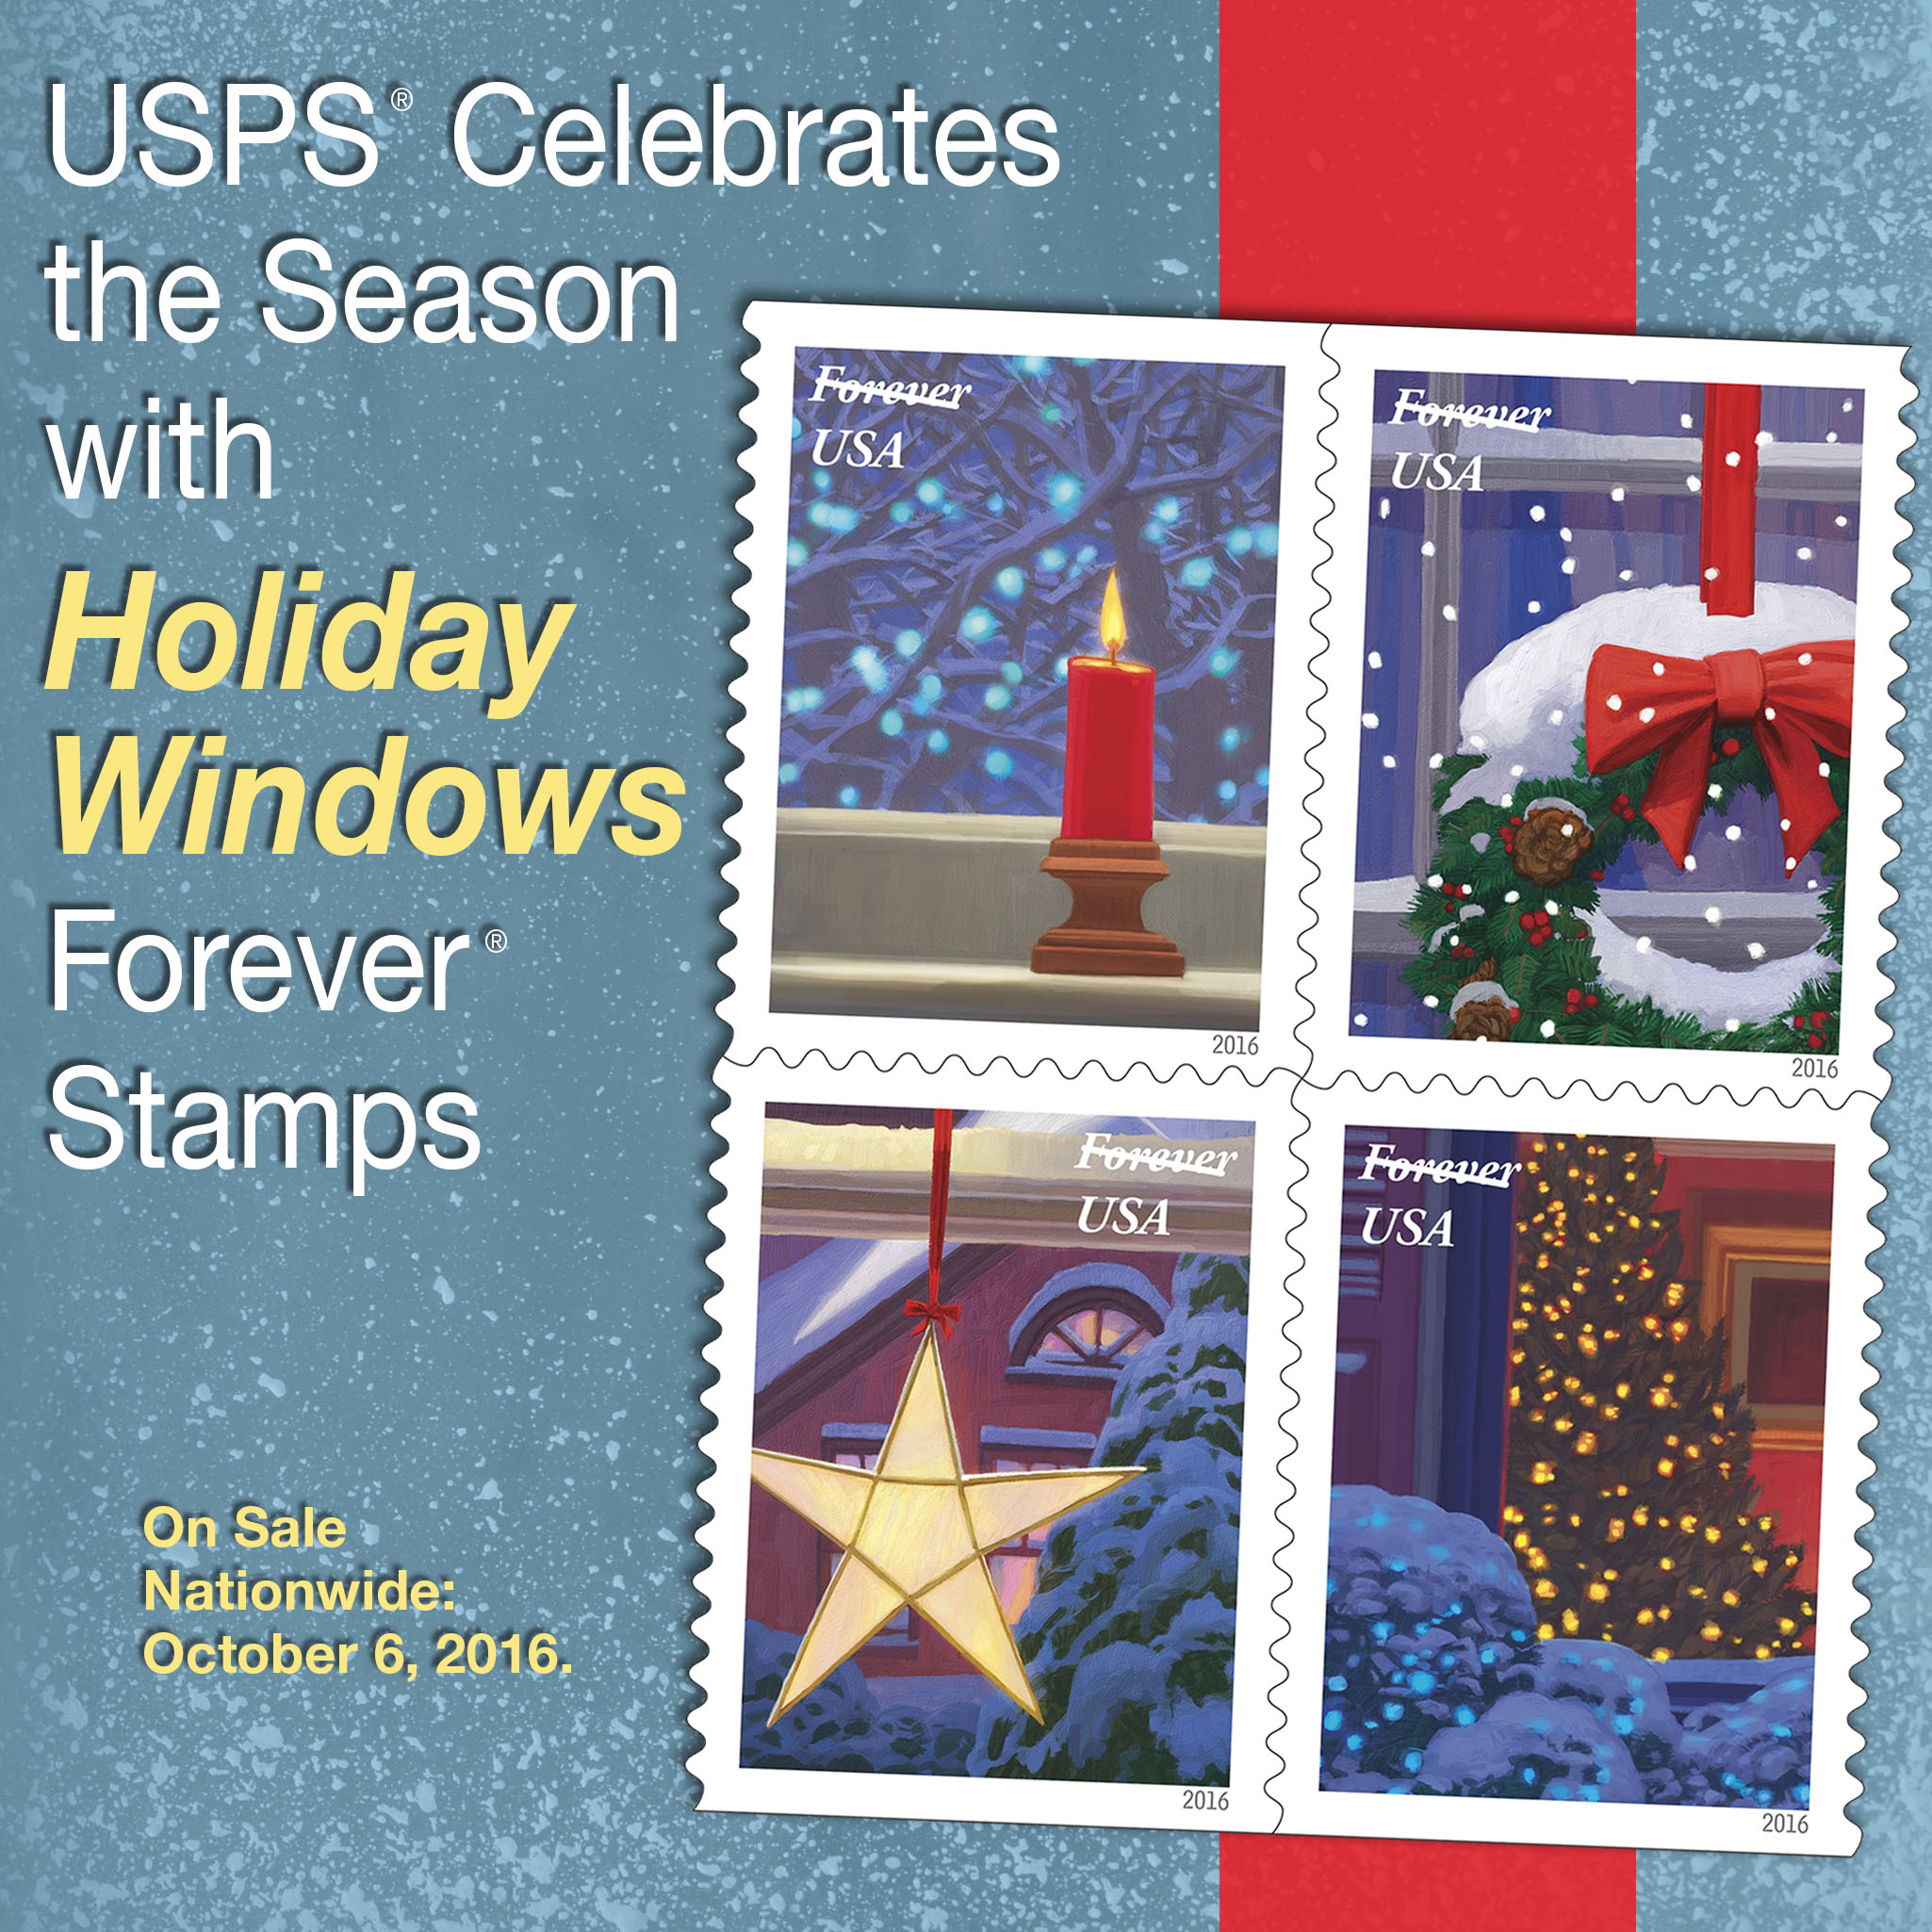 Usa Forever Stamp Value - Desain Terbaru Rumah Modern Minimalis